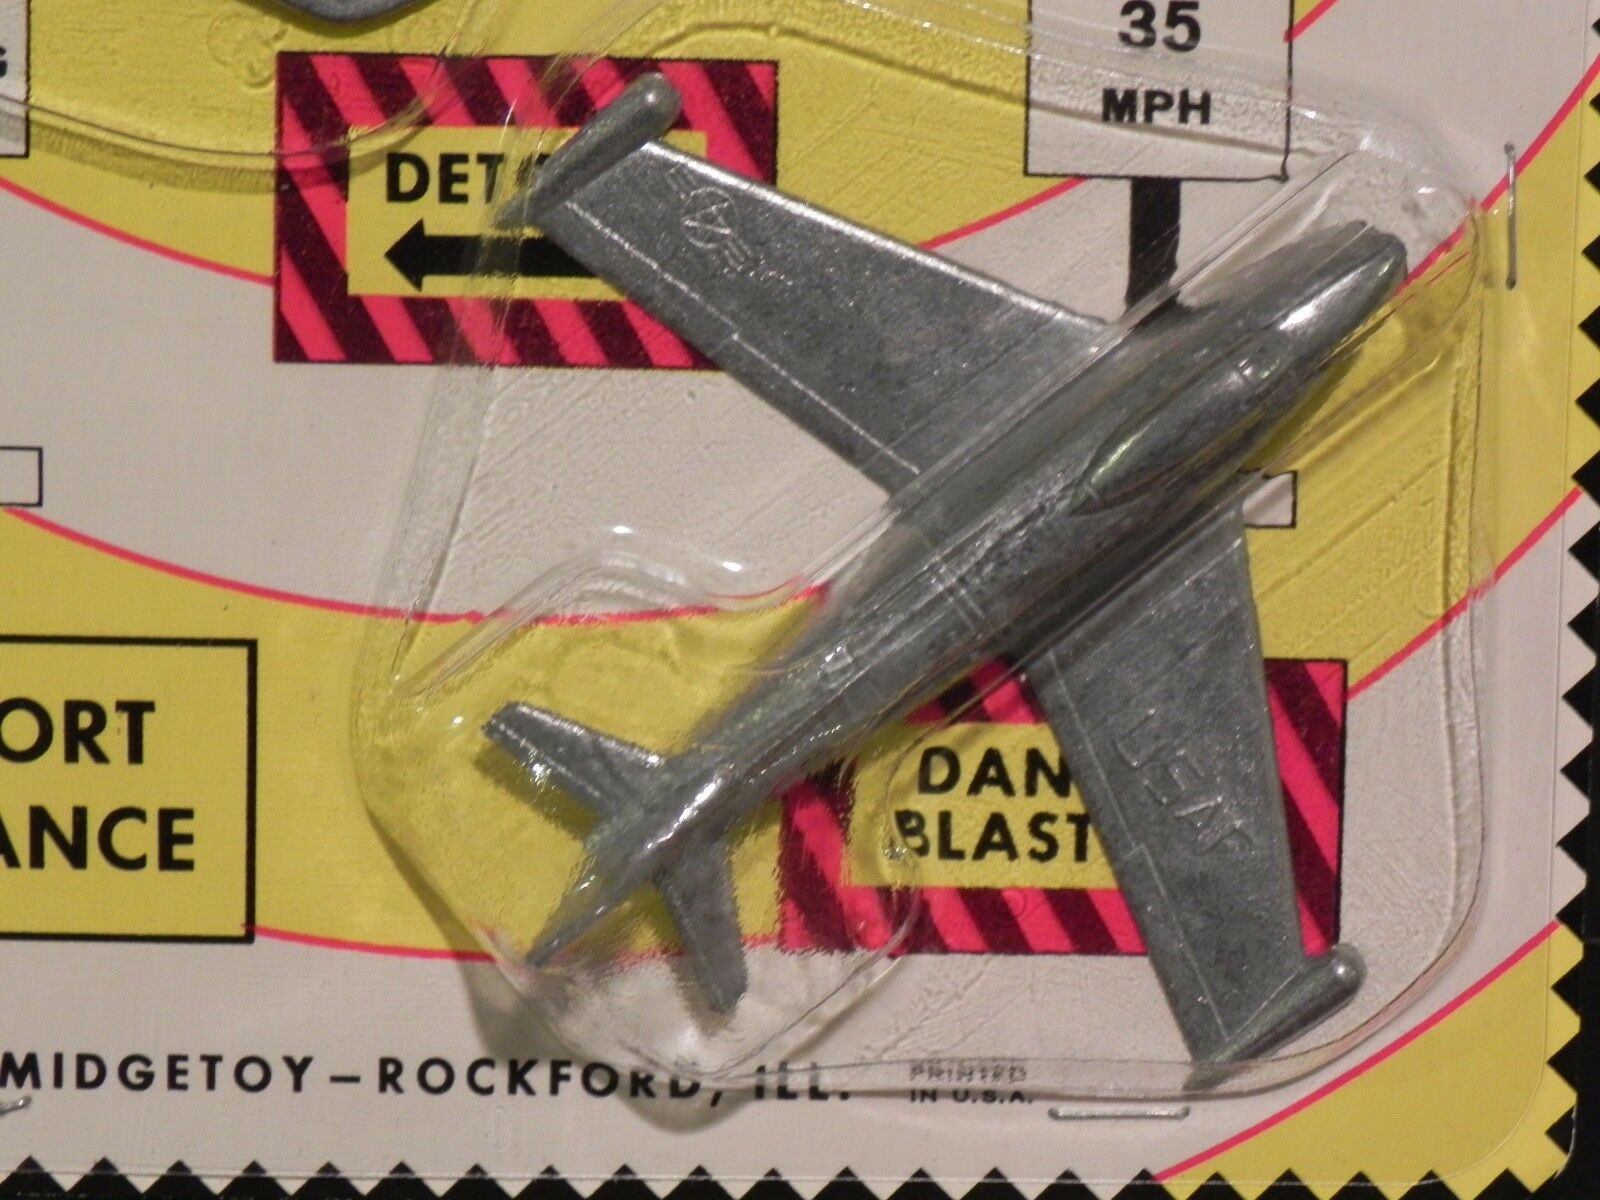 MIDGETOY VINTAGE DIE-CAST 2 AIRPLANES AIRPLANES AIRPLANES NEW ON CARD - NAVY & USAF NOS - Free Ship 2b3d3b